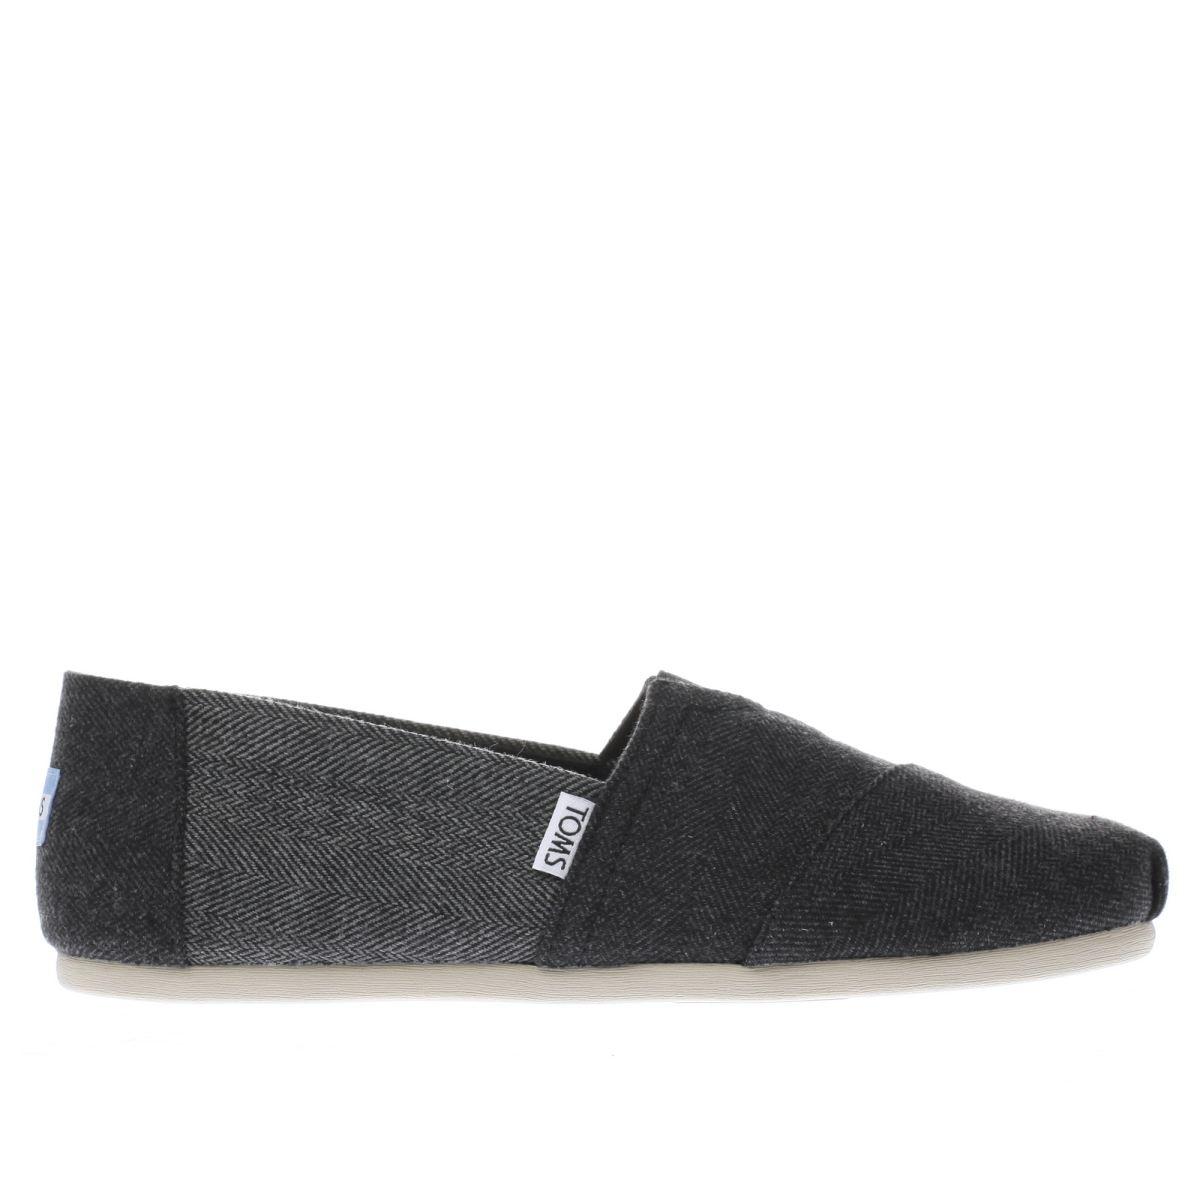 toms black & grey seasonal classic shoes